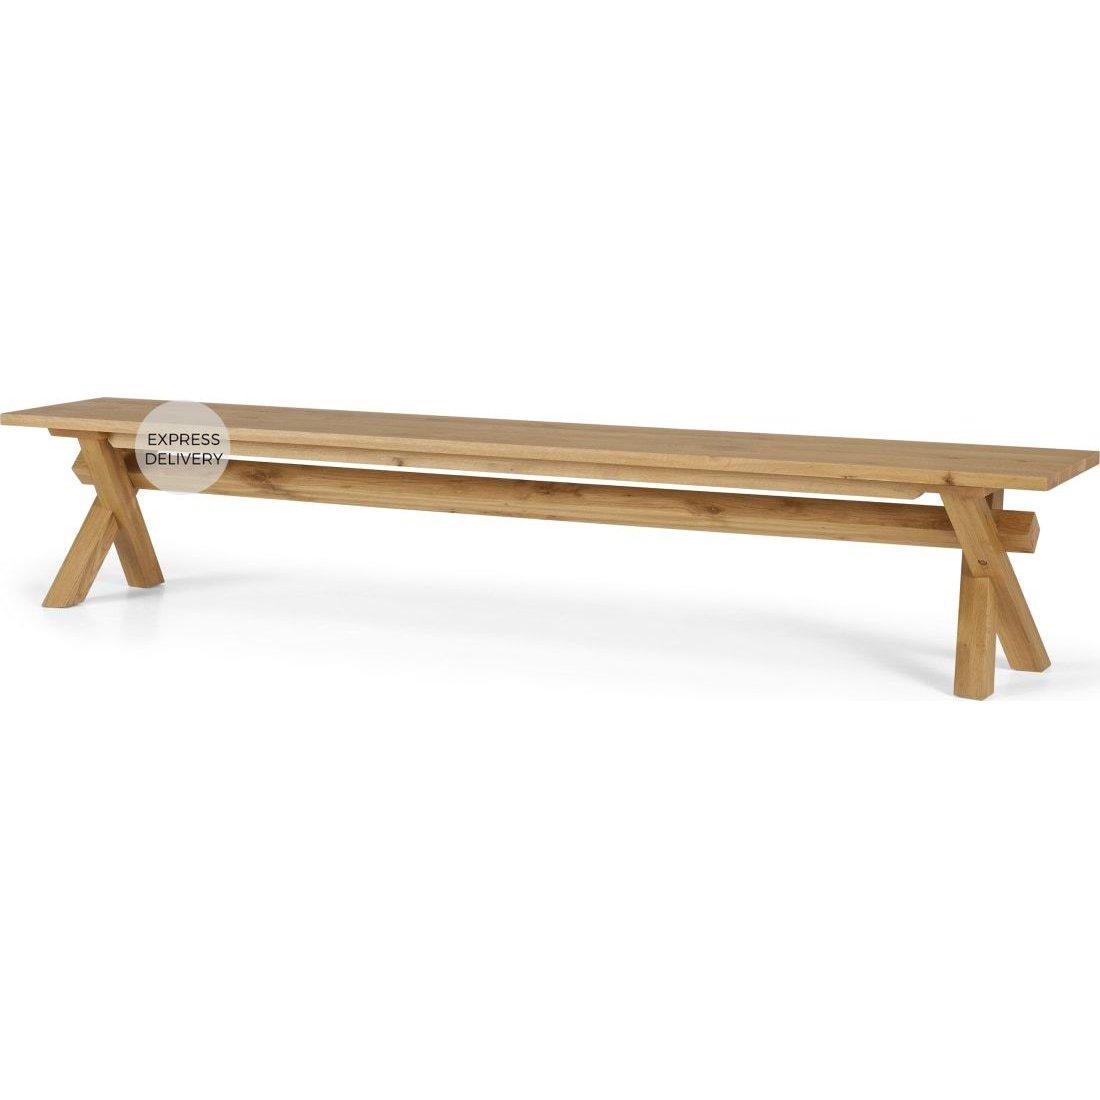 image-Bayron 5 Seat Dining Bench, Brushed Solid Oak